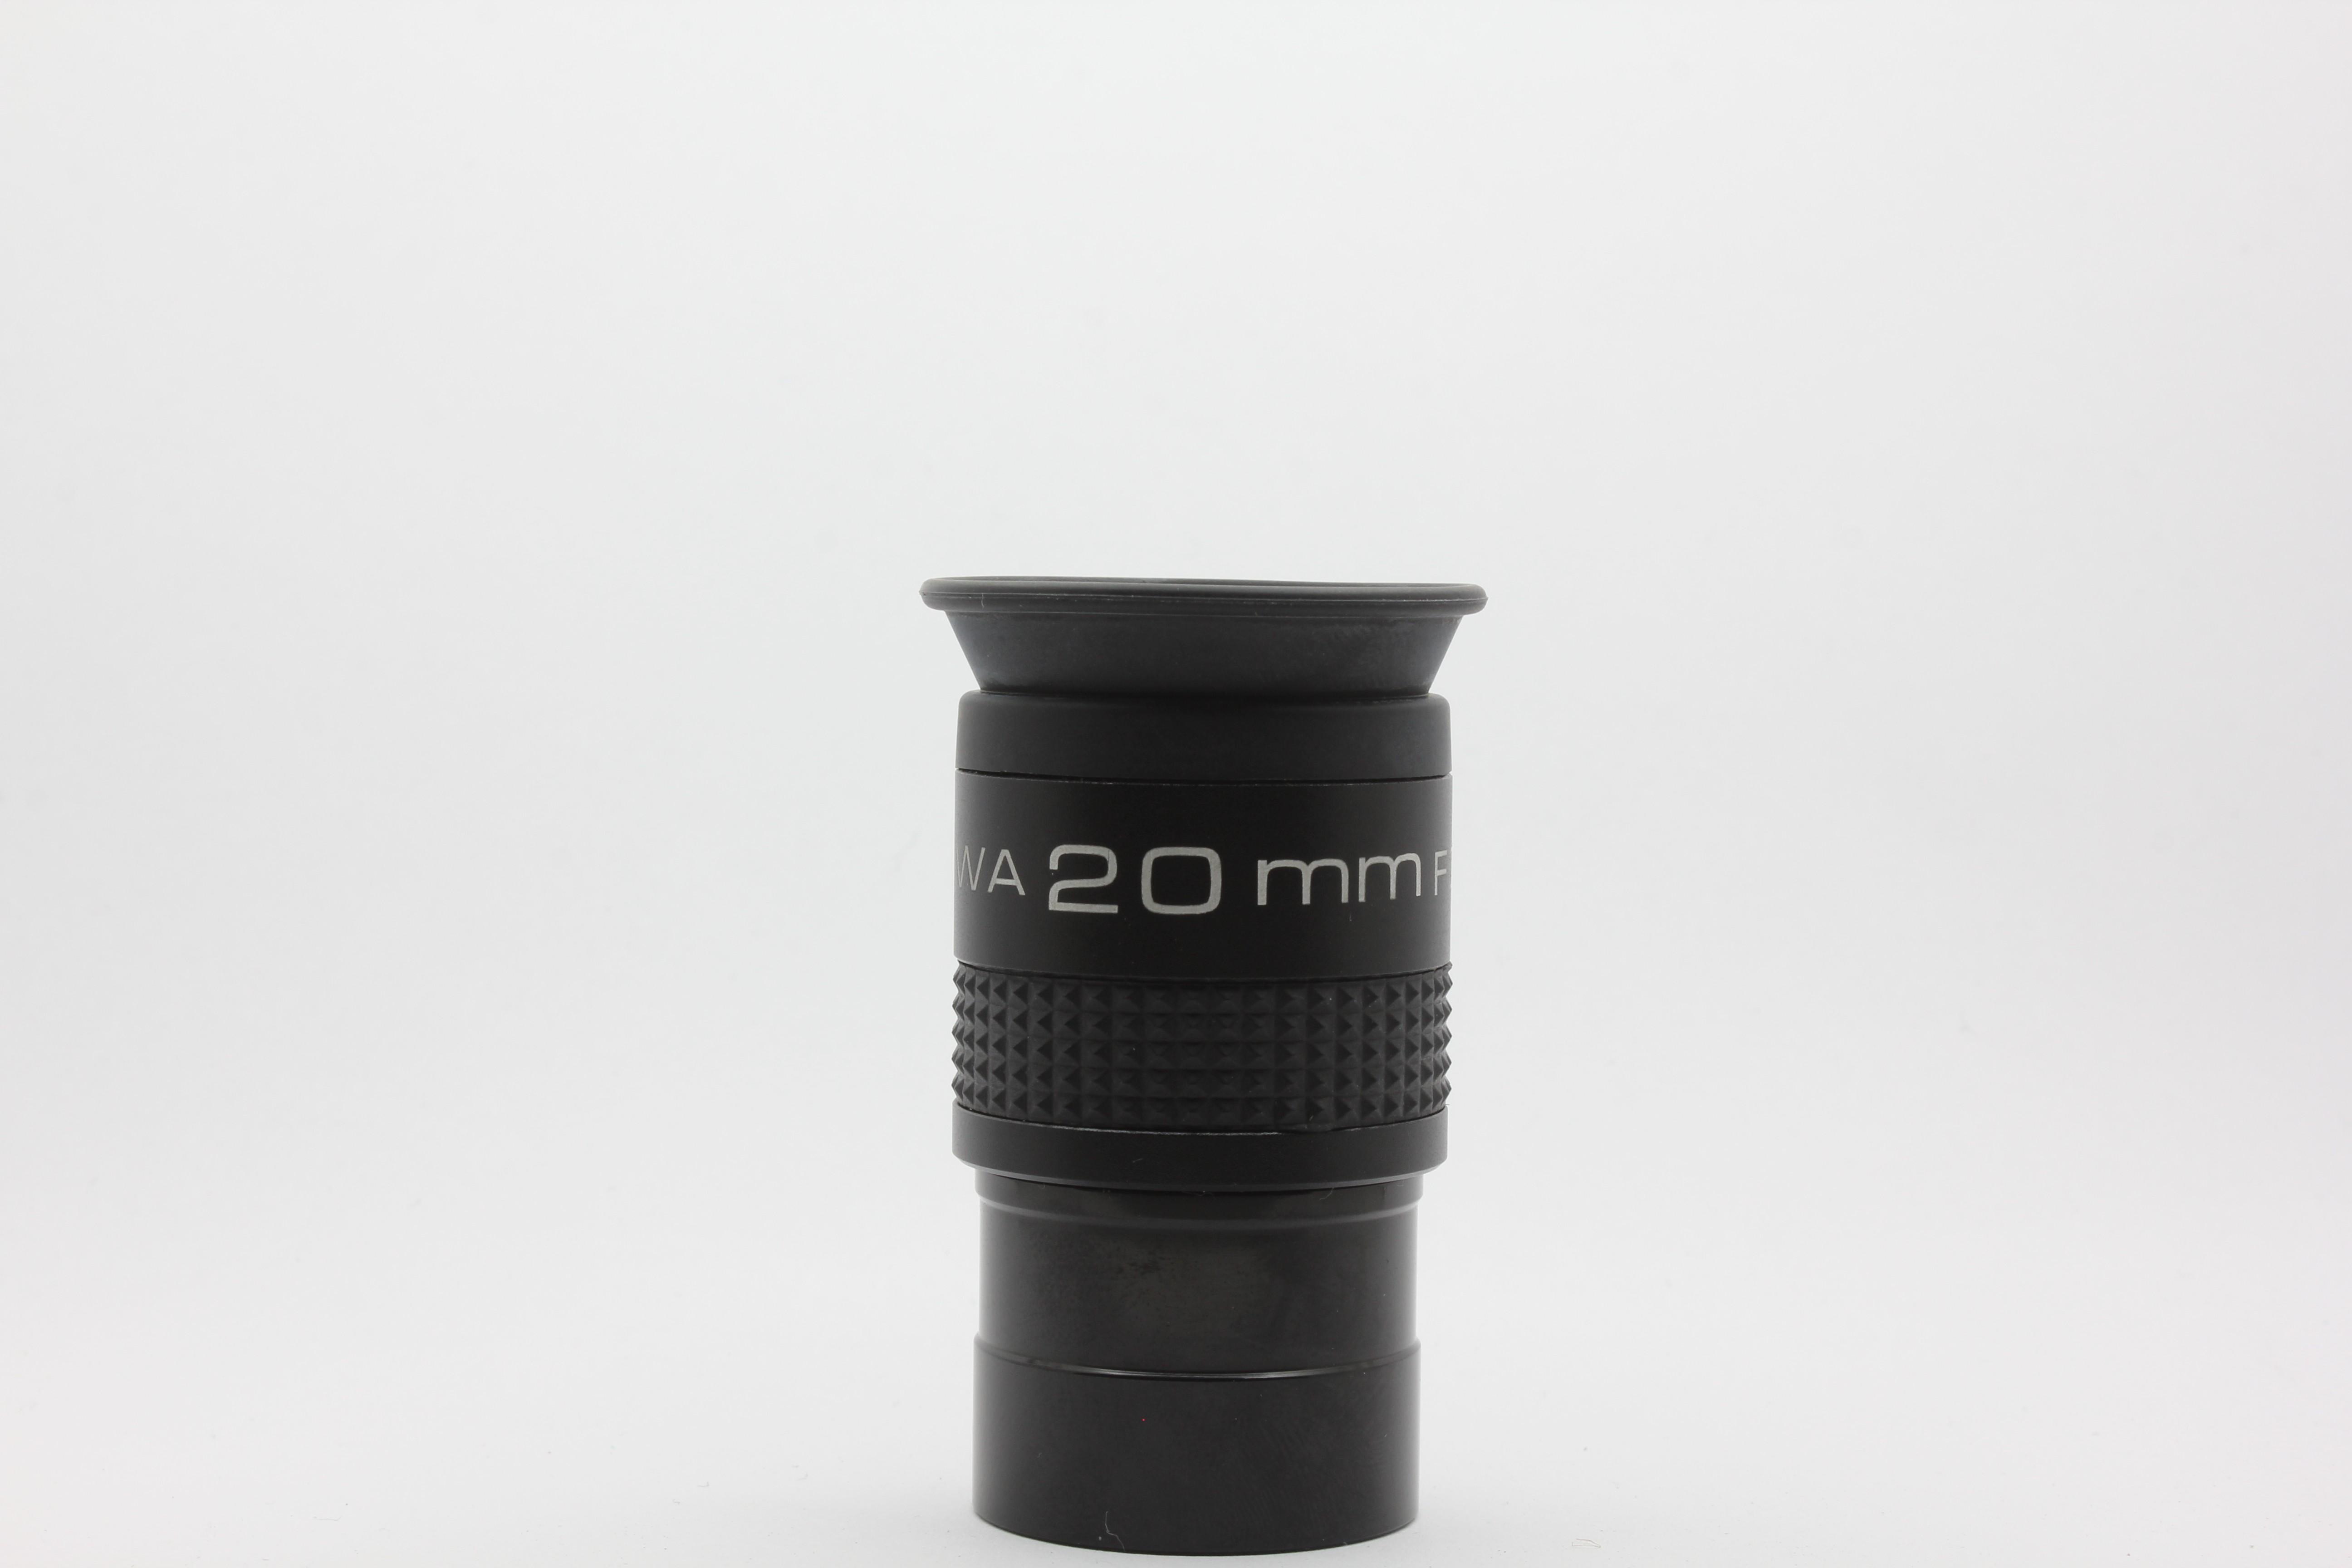 Sirius 20mm 1.25in 60-65 deg WA eyepiece